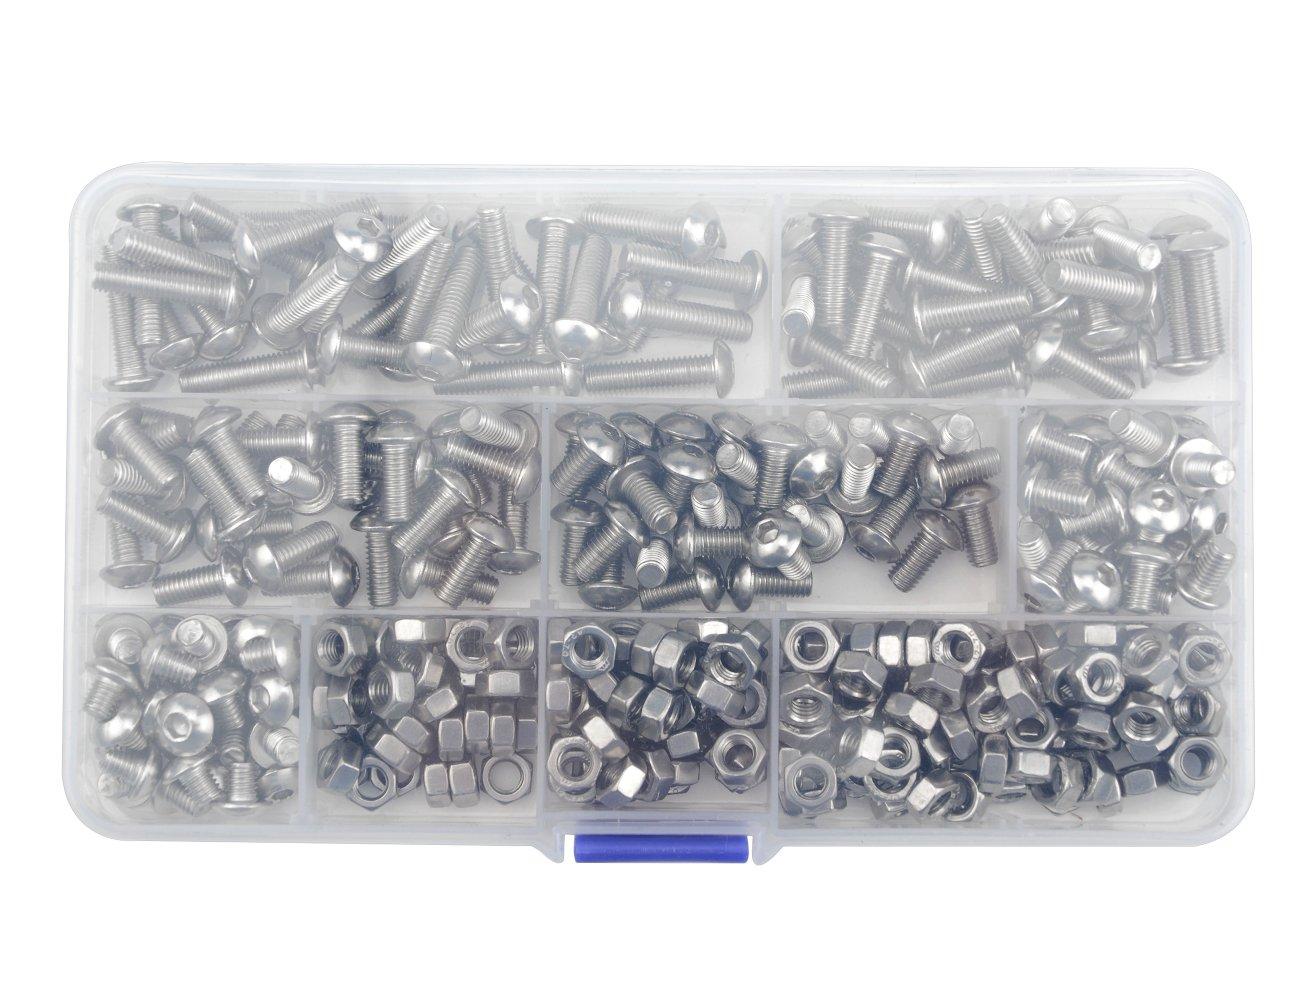 WGCD 360 PCS M5 Stainless Steel Hex Socket Button Head Cap Bolts Screws Nuts Assortment Kit M5